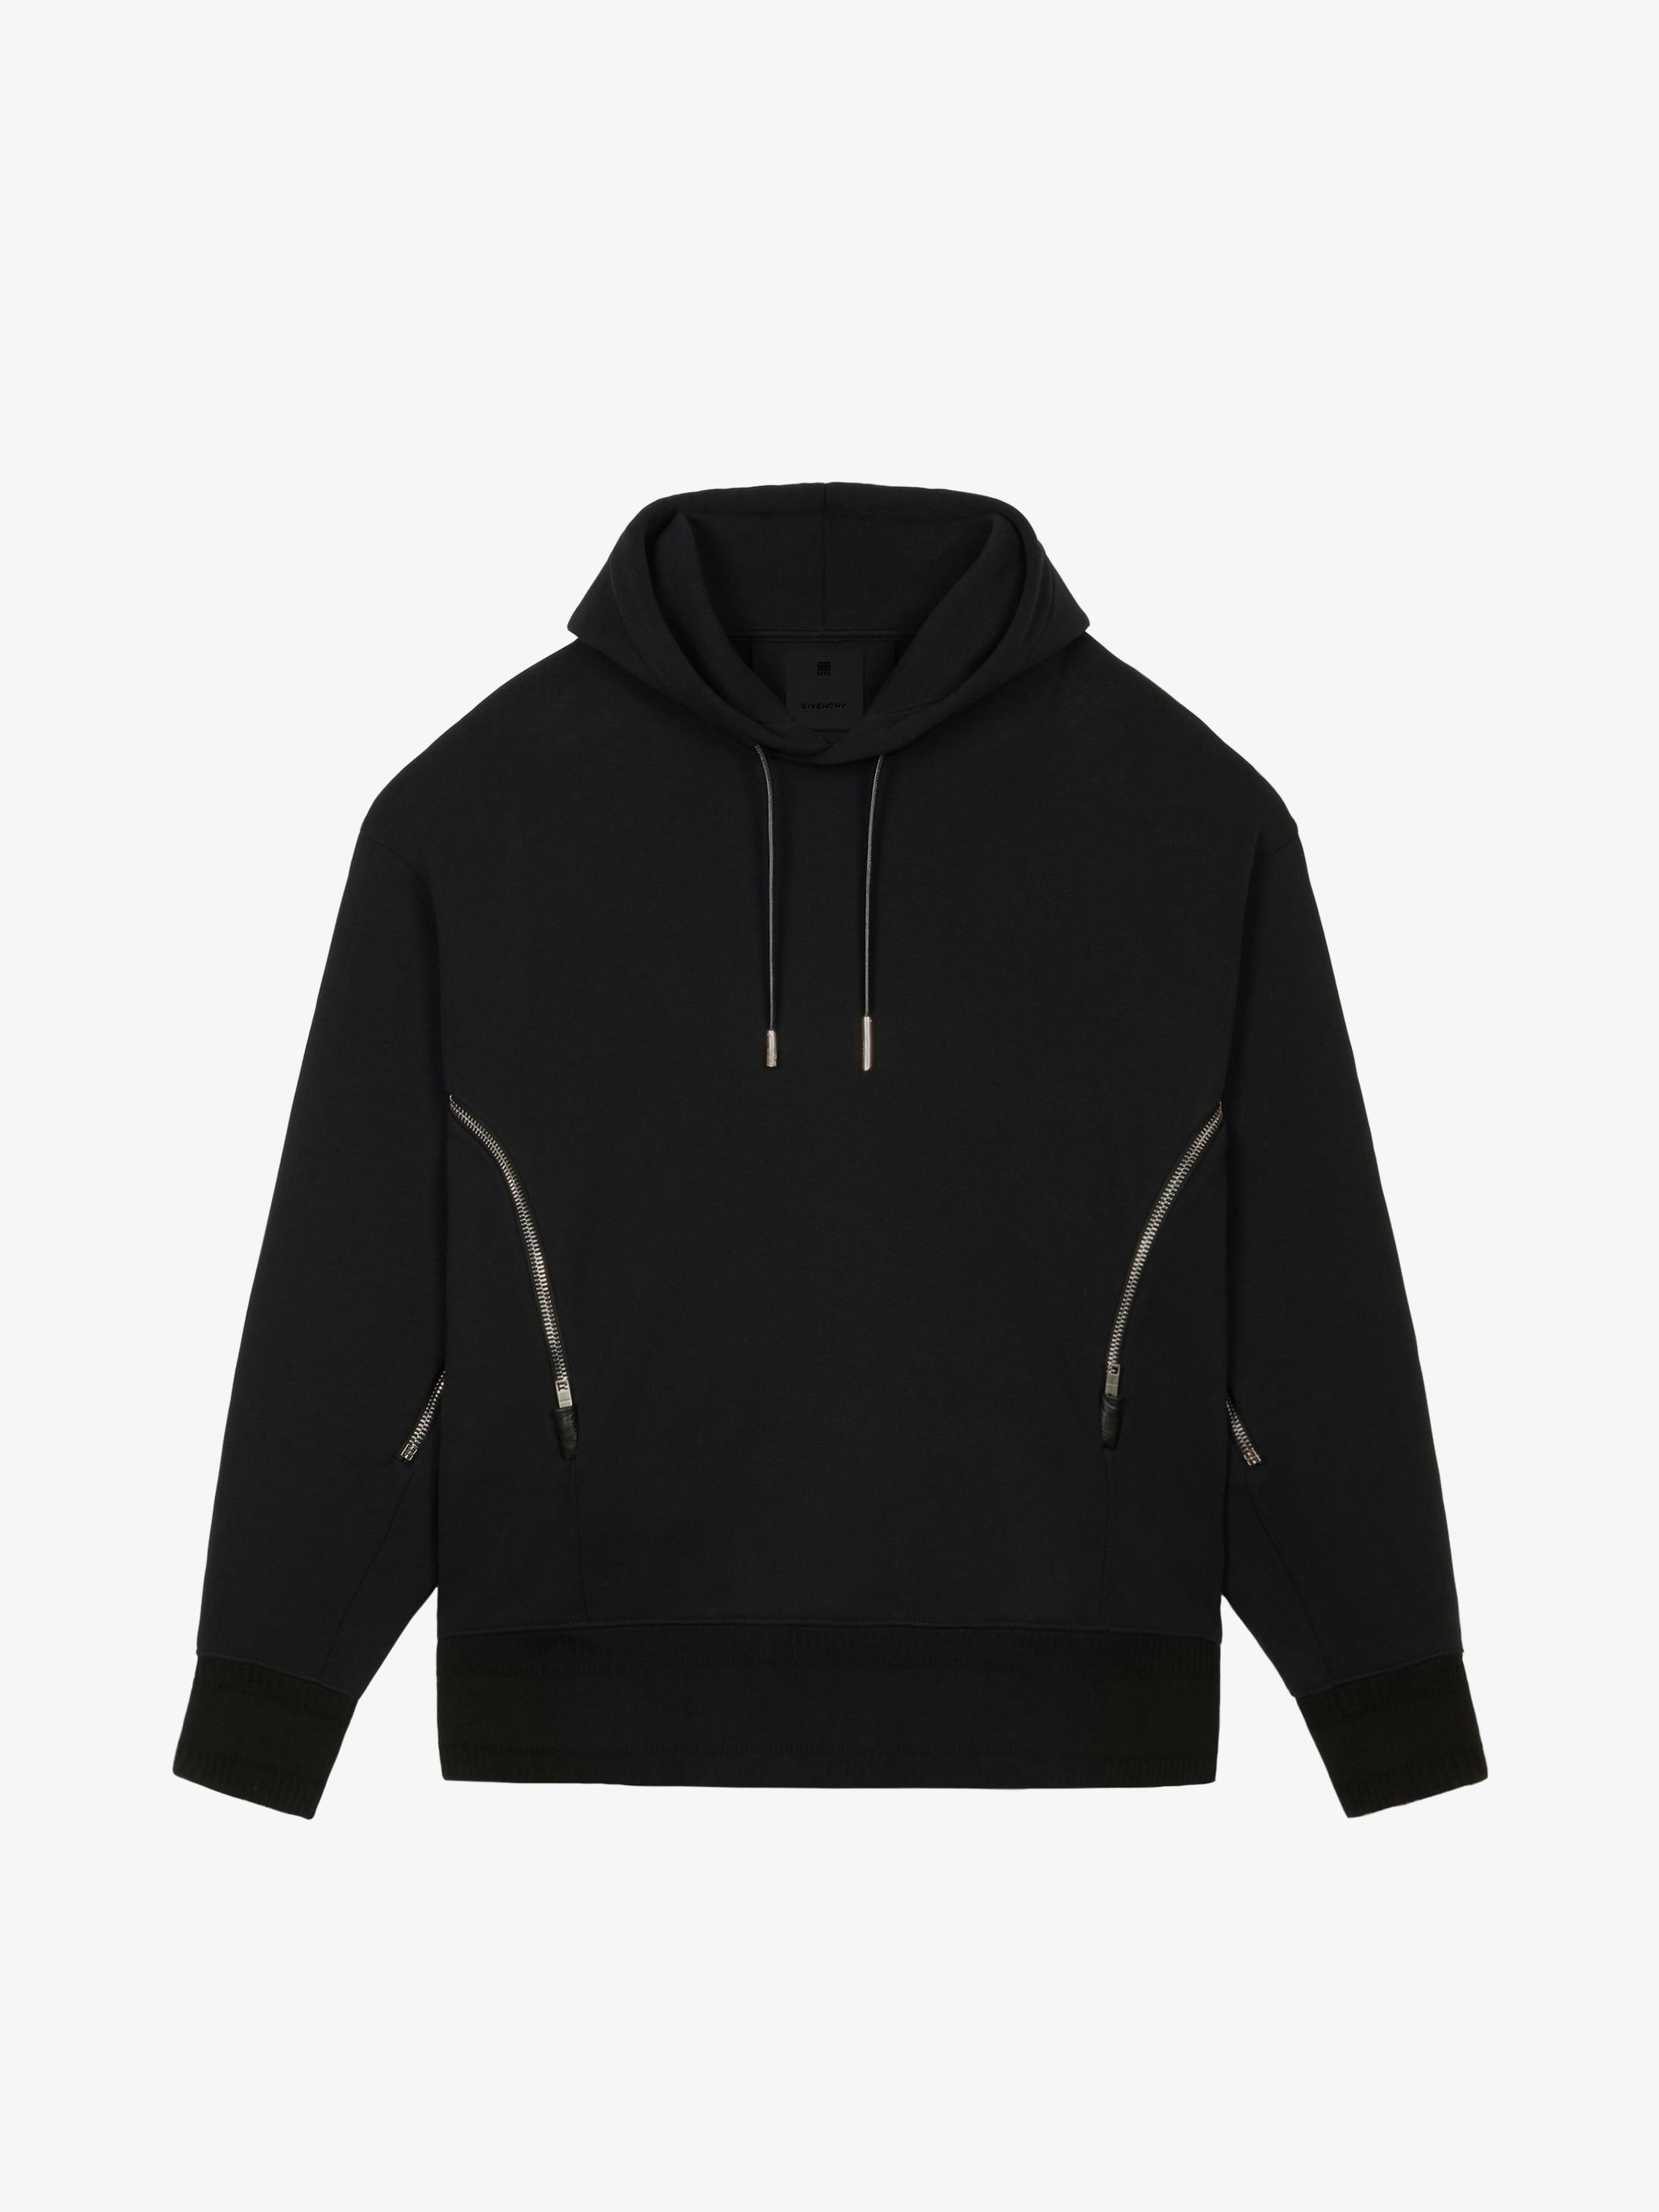 Sweatshirt à capuche oversized avec zips